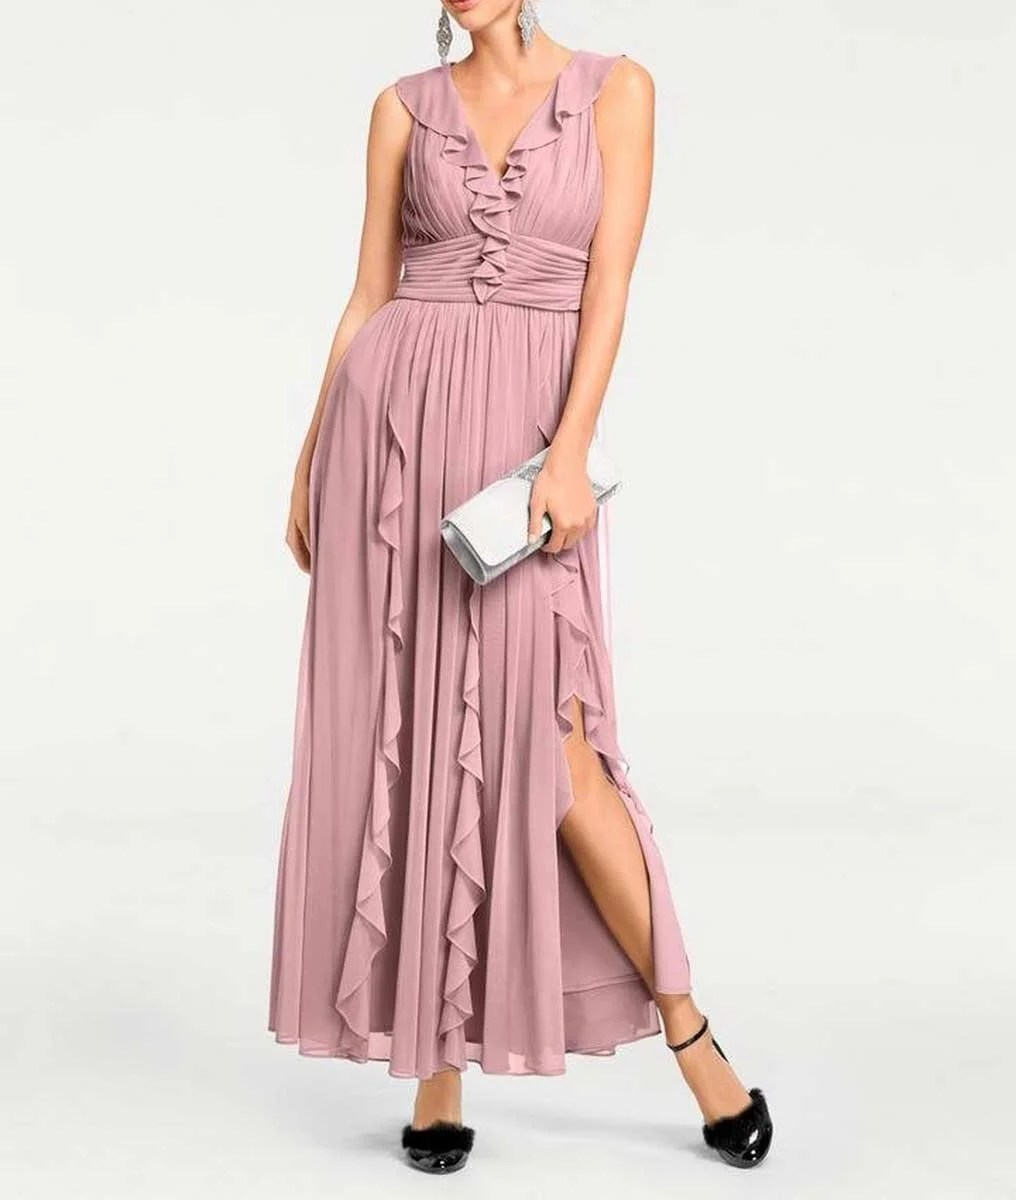 Festmoden Ashley Brooke Abendkleid rosè 099.300 Missforty